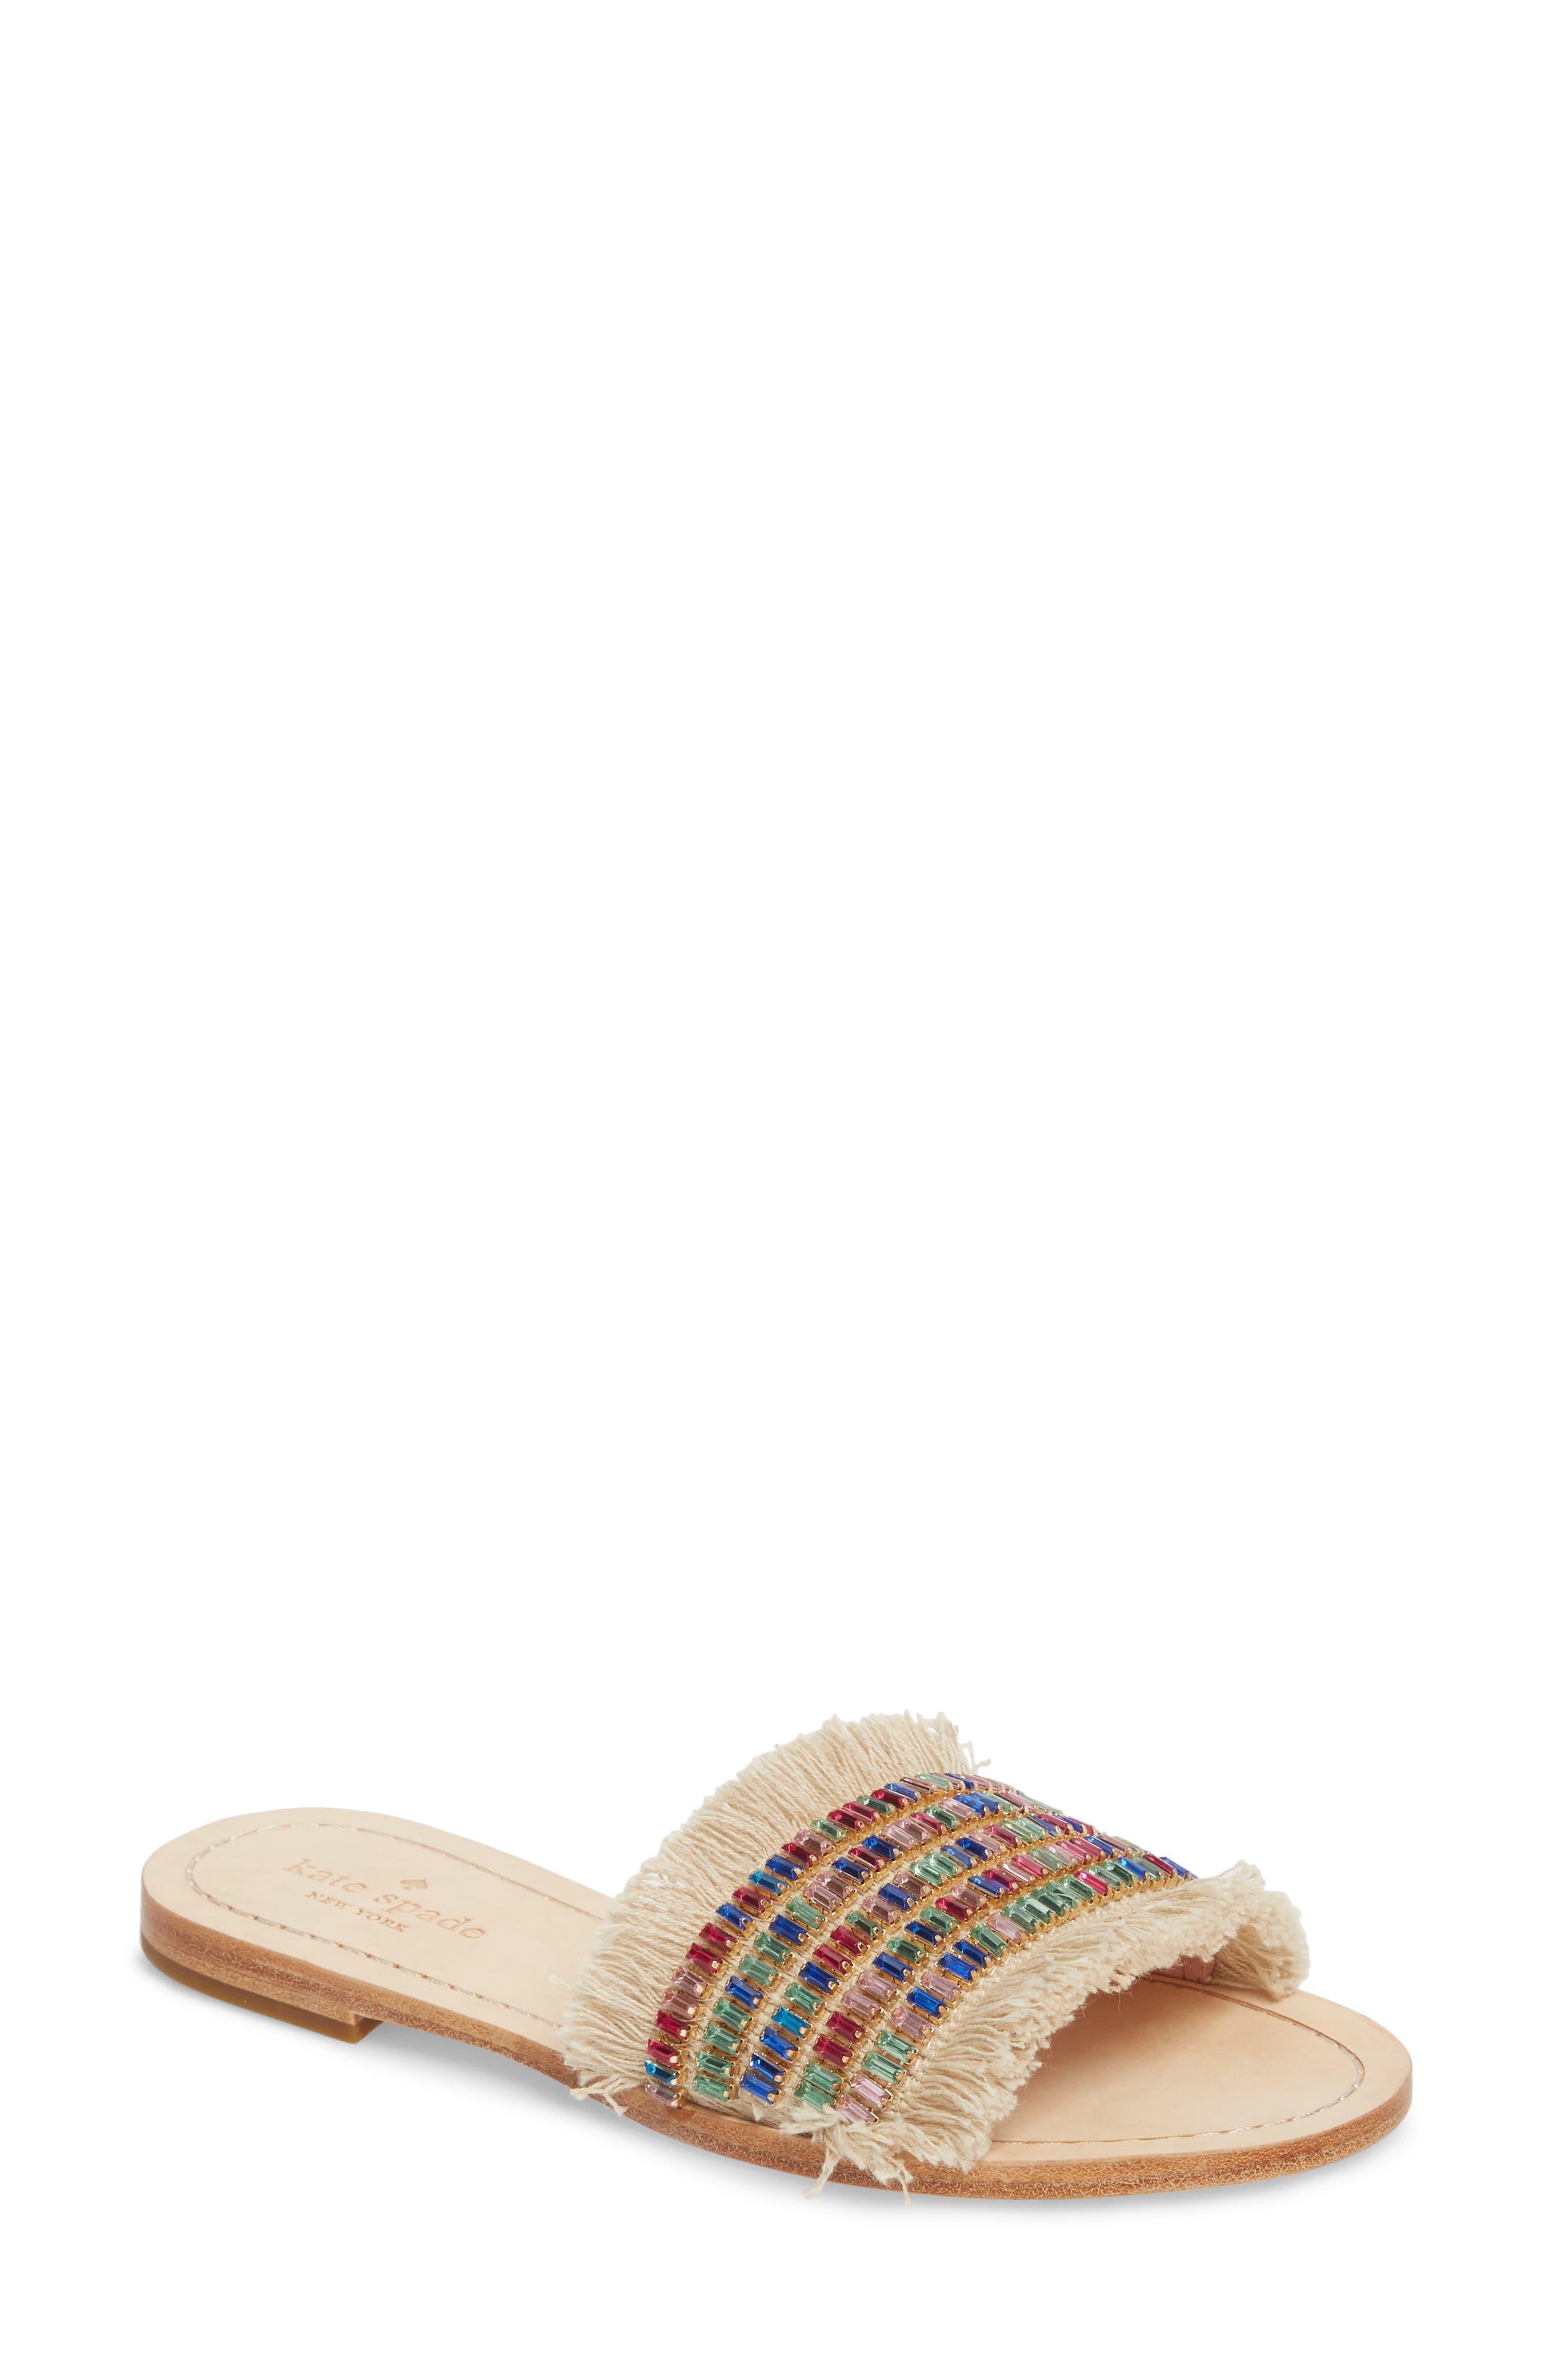 solaina slide sandal,                         Main,                         color, Natural/ Multi